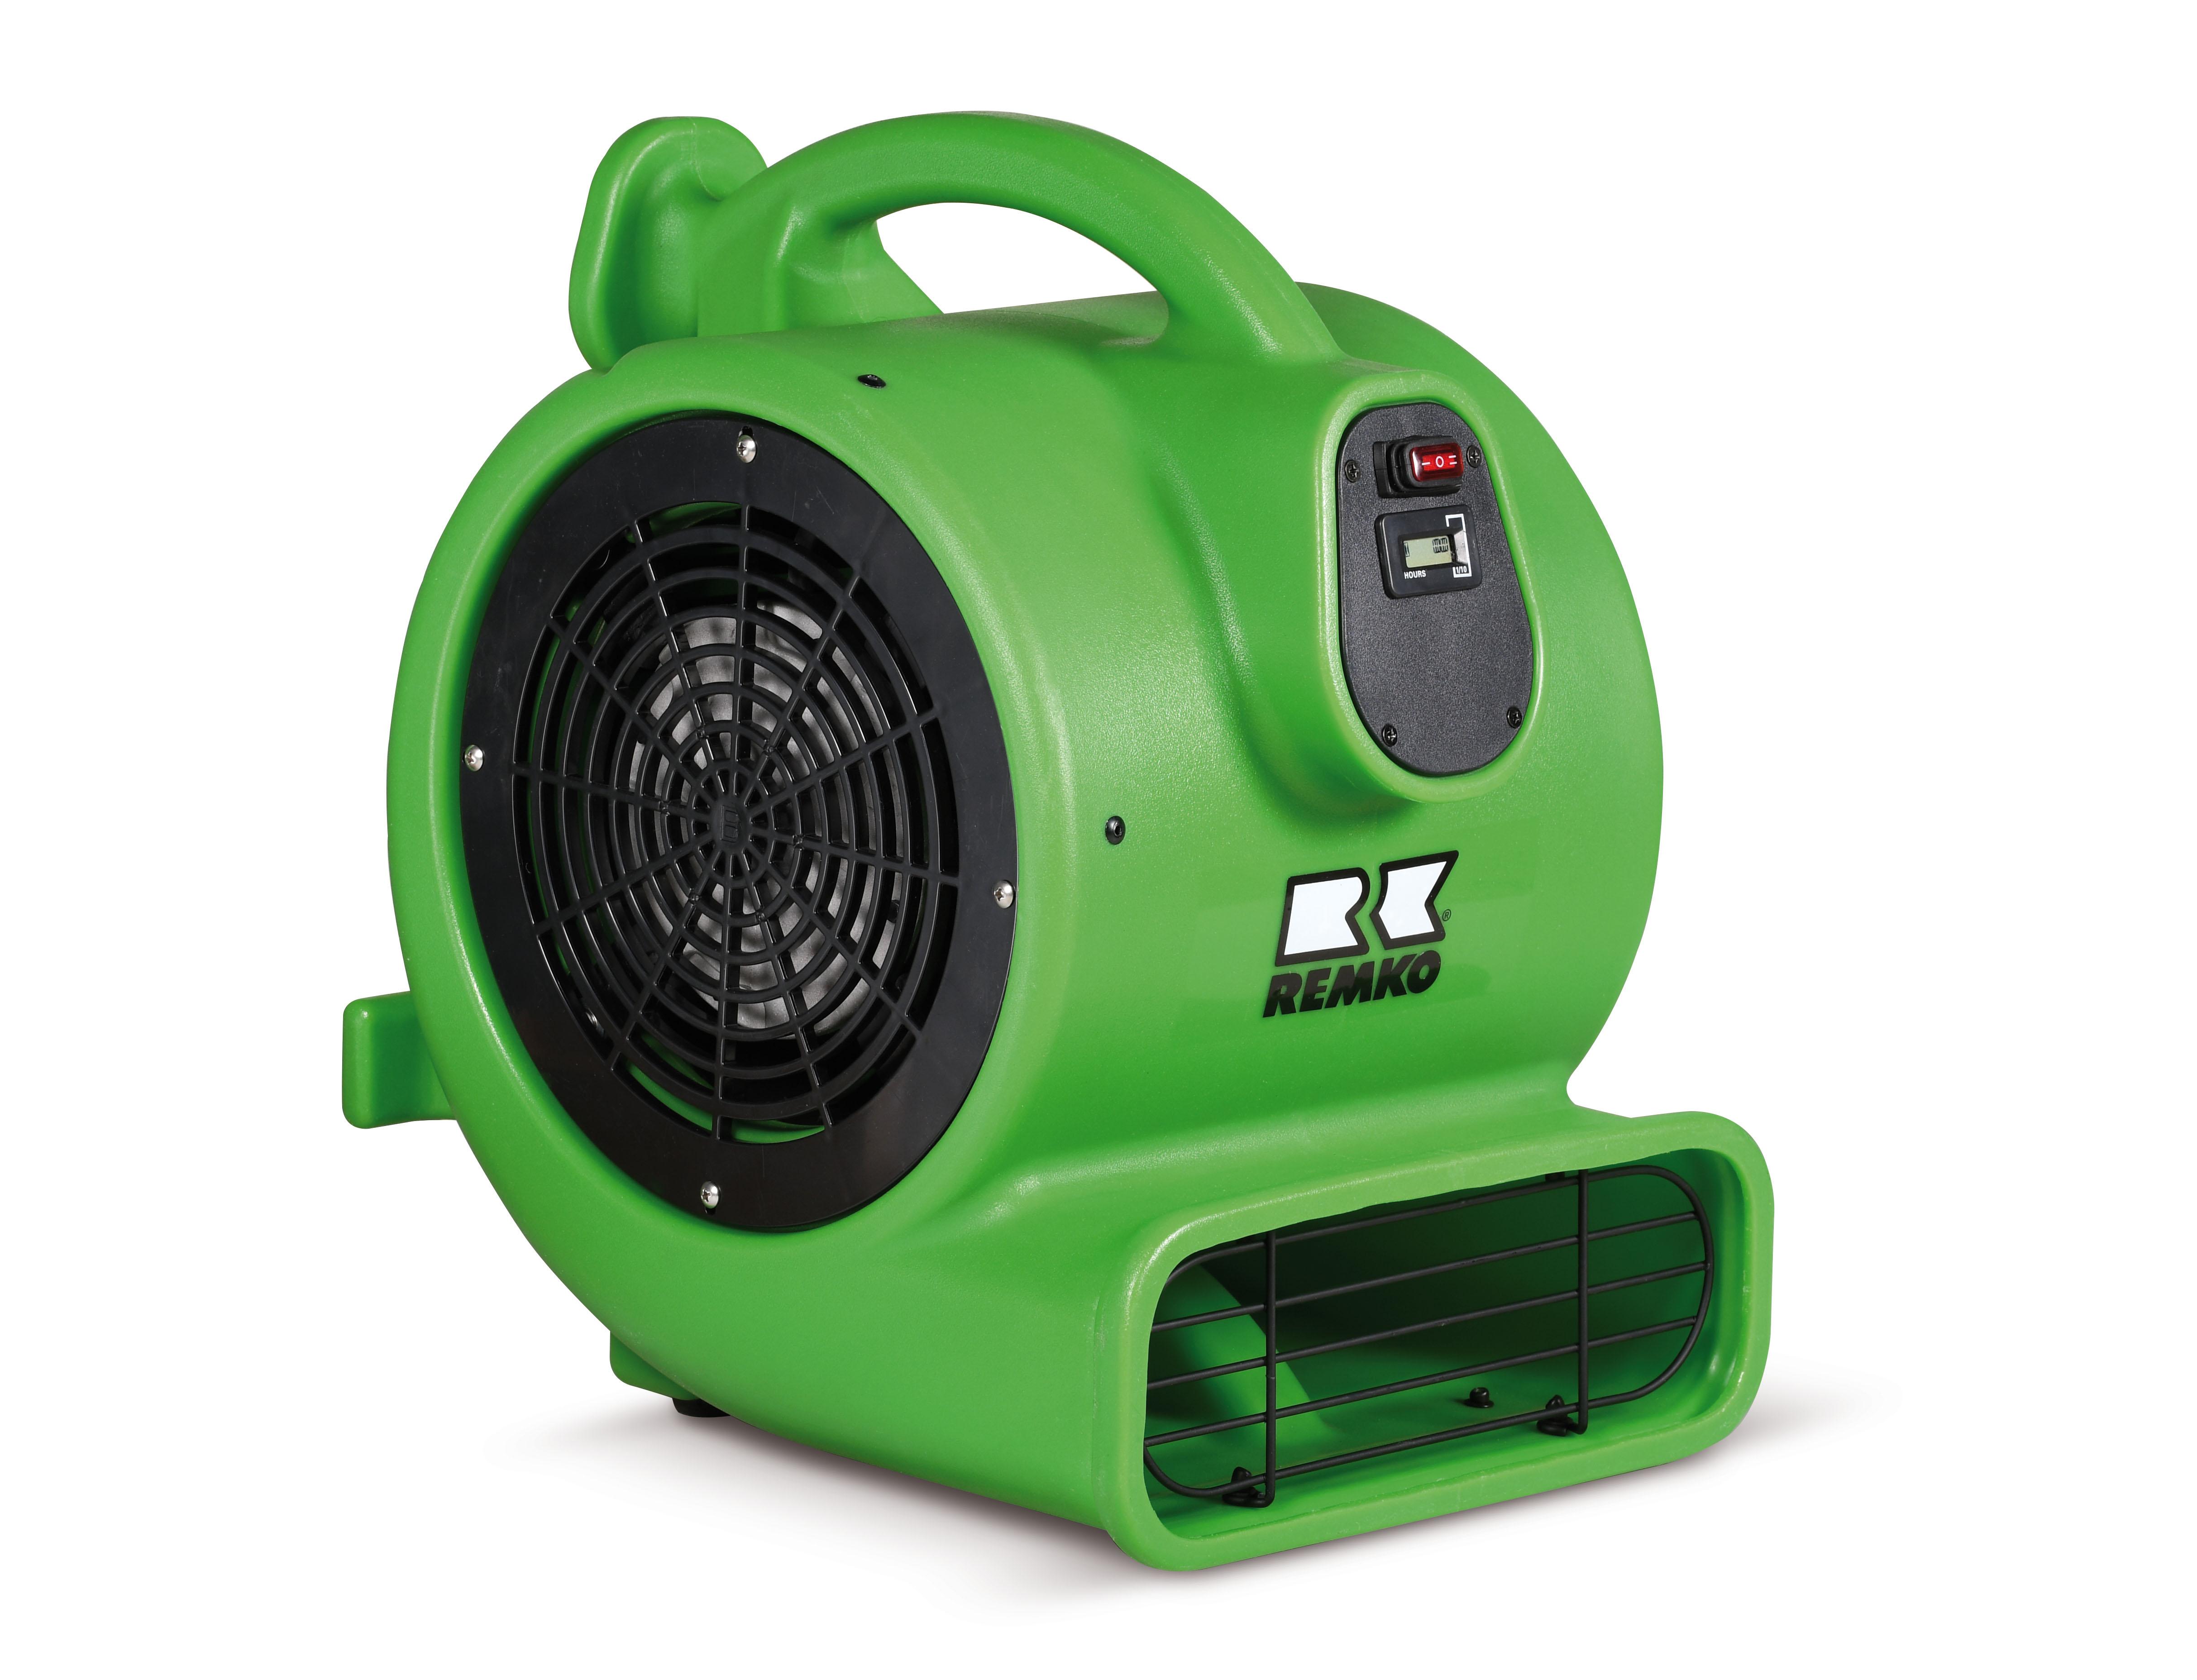 REMKO RTV 20 Turbo-Ventilator inkl. Stundenzähler